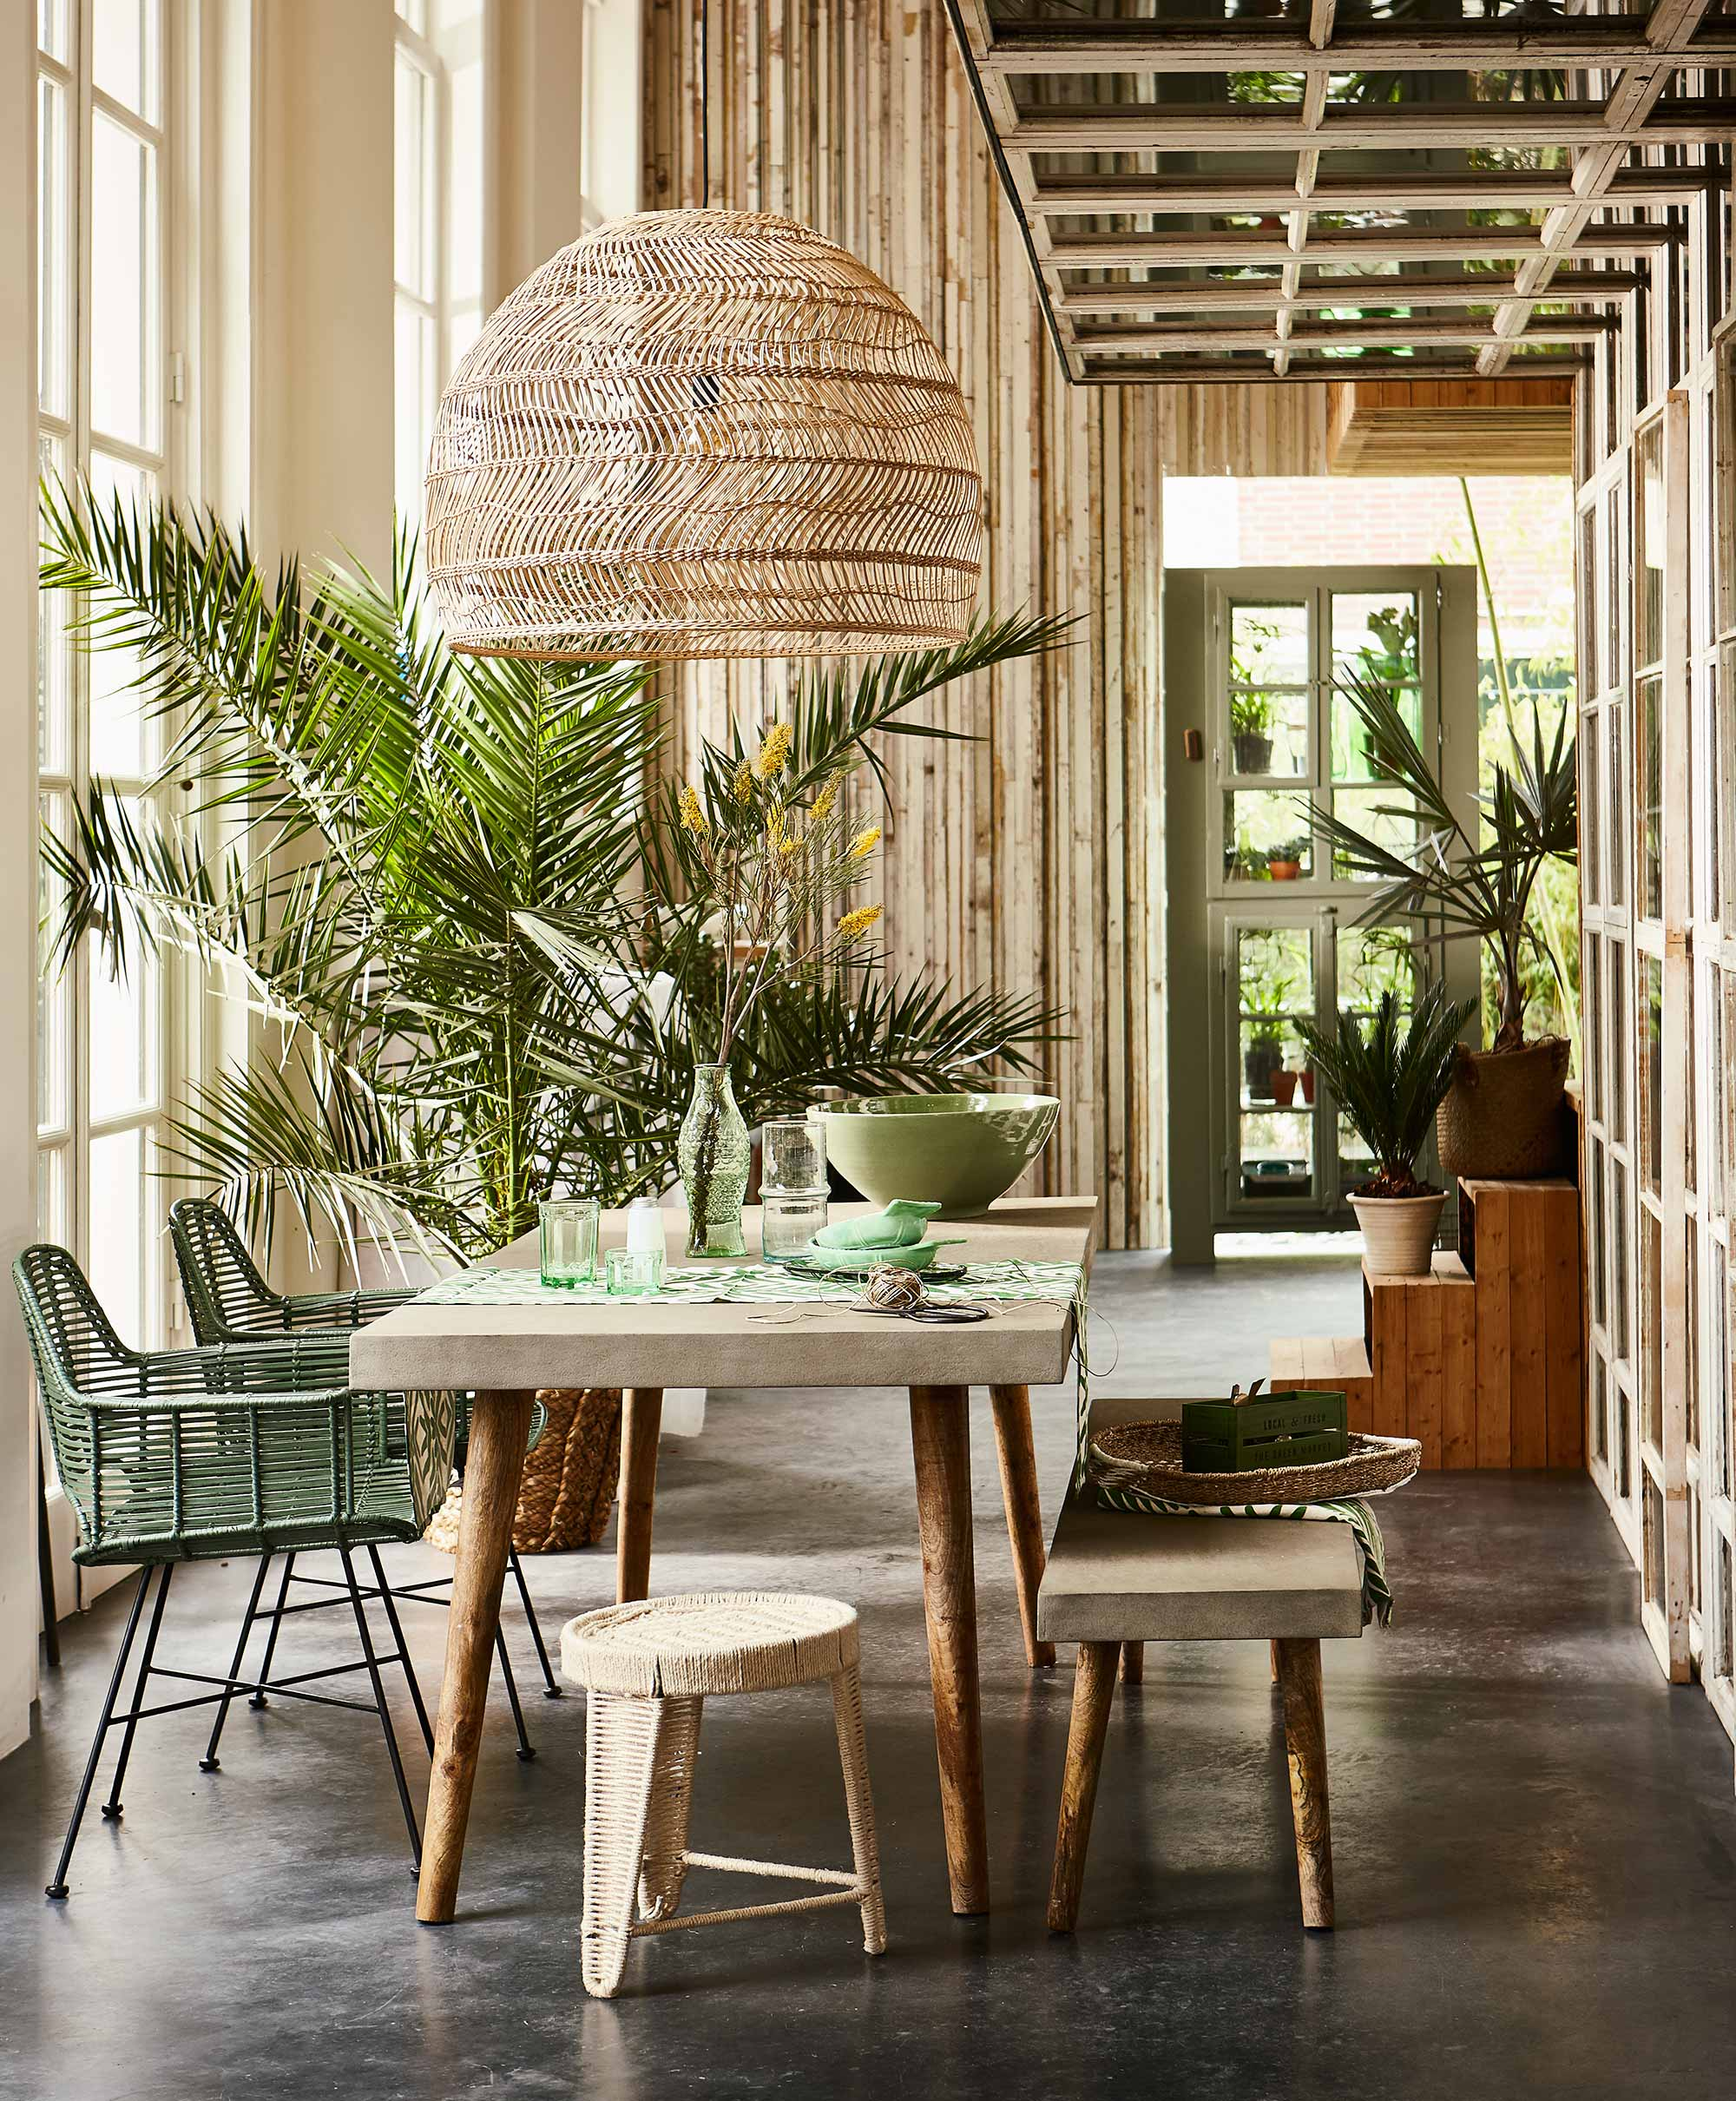 apporter la nature dans la maison planete deco a homes world bloglovin. Black Bedroom Furniture Sets. Home Design Ideas